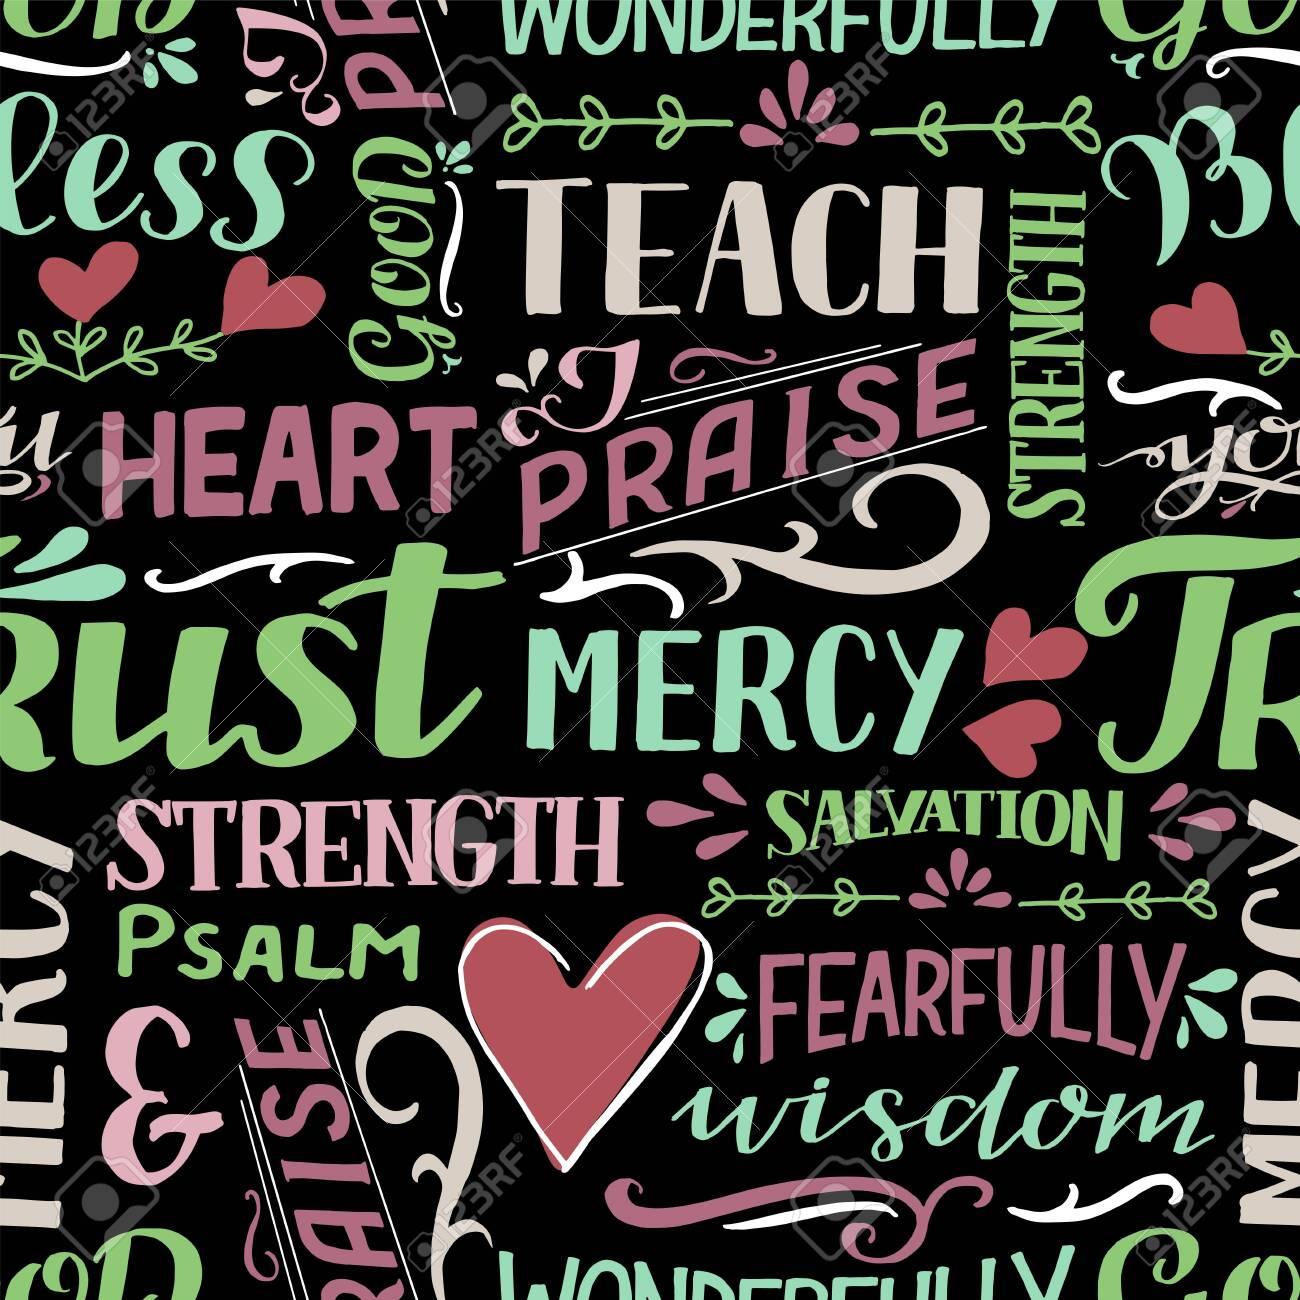 Seamless pattern with hand drawn words Mercy, Trust, Salvation, Wisdom, Psalm, Praise. - 155780867